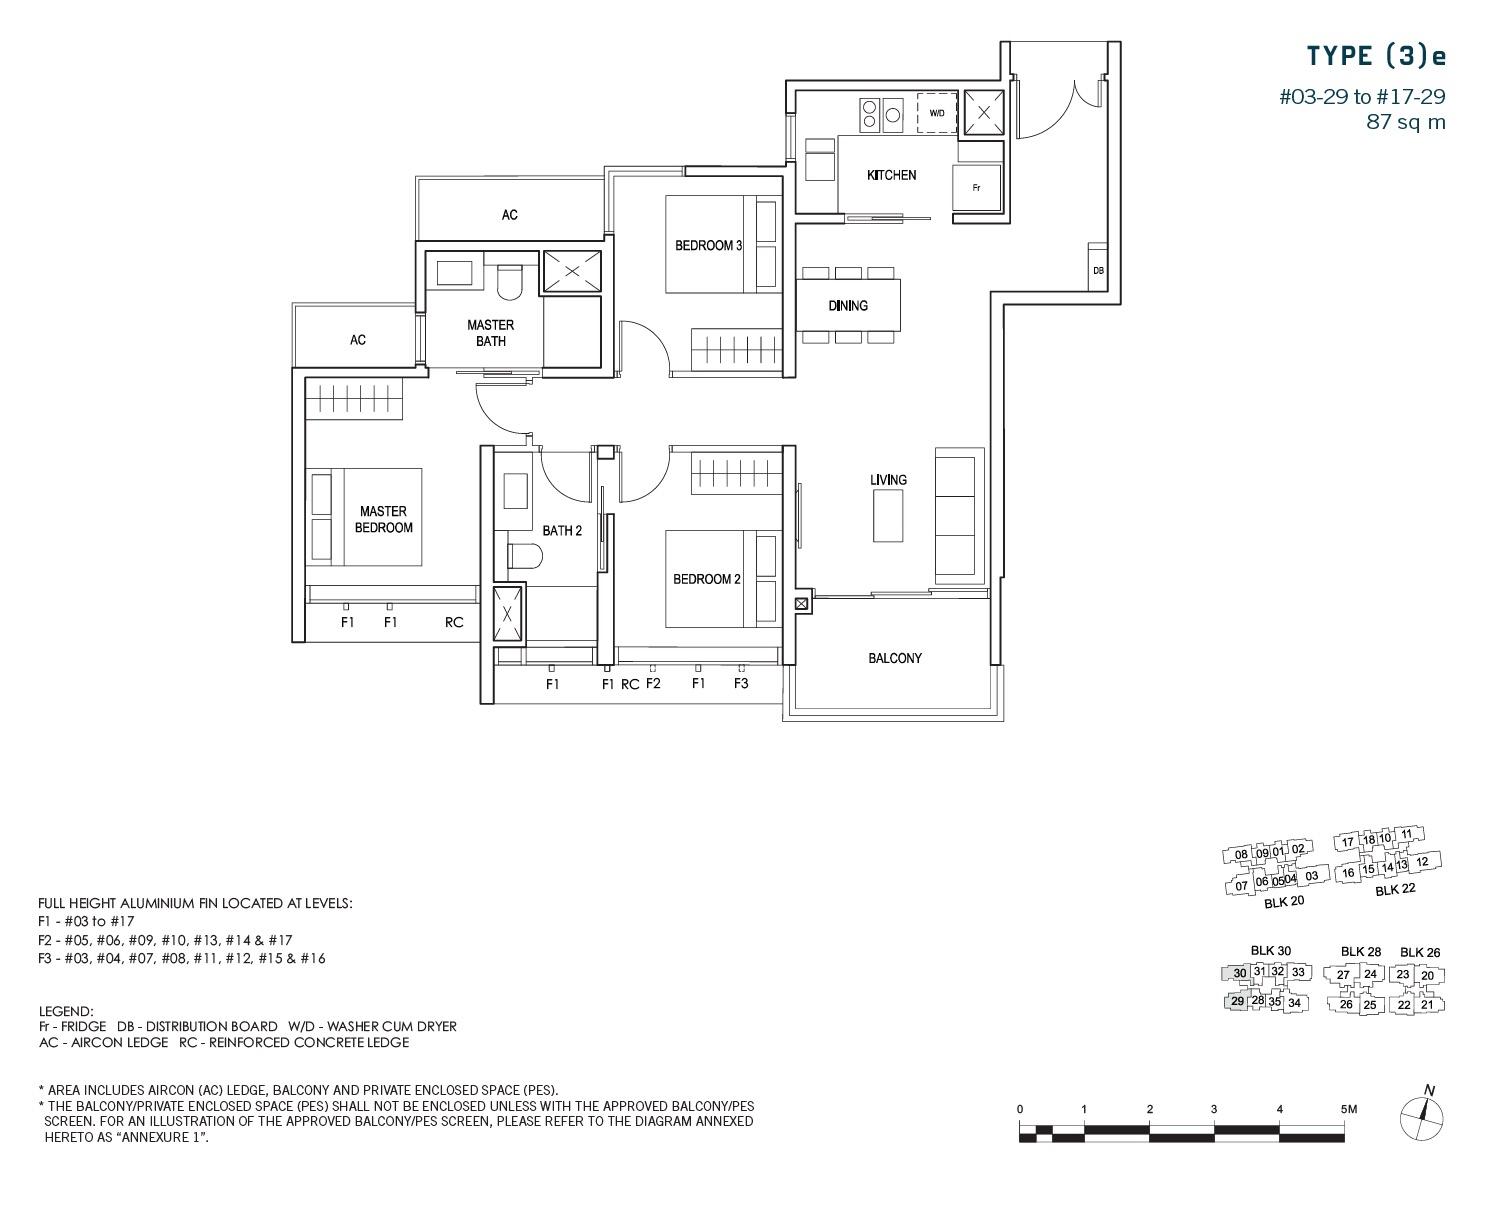 penrose-sims-floorplan 3BR-e